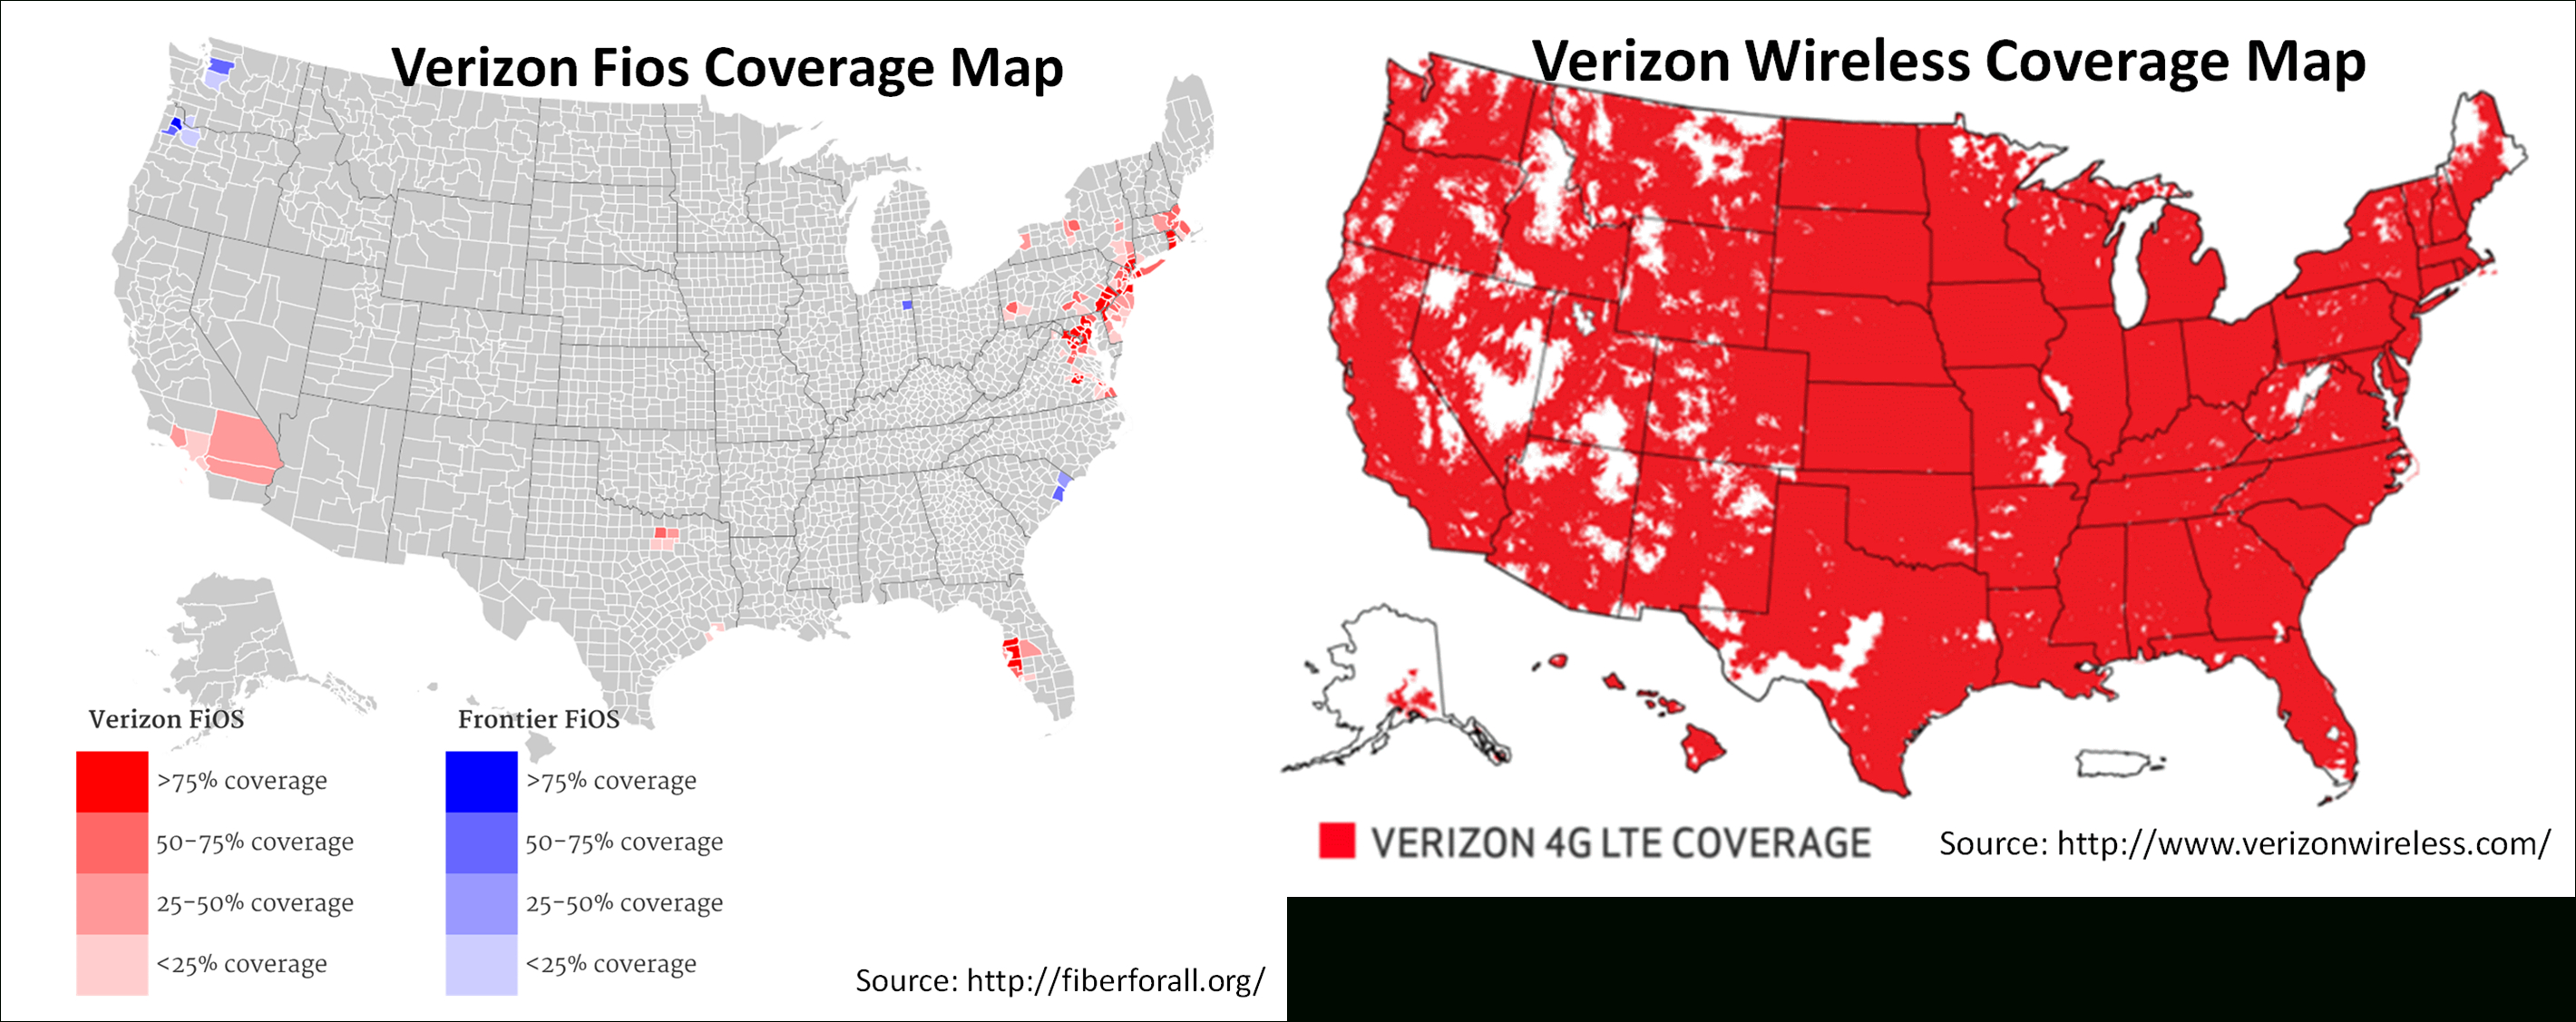 Verizon's Acquisition Of Aol Is A Move To Disrupt The Tv Market - Verizon Coverage Map In California